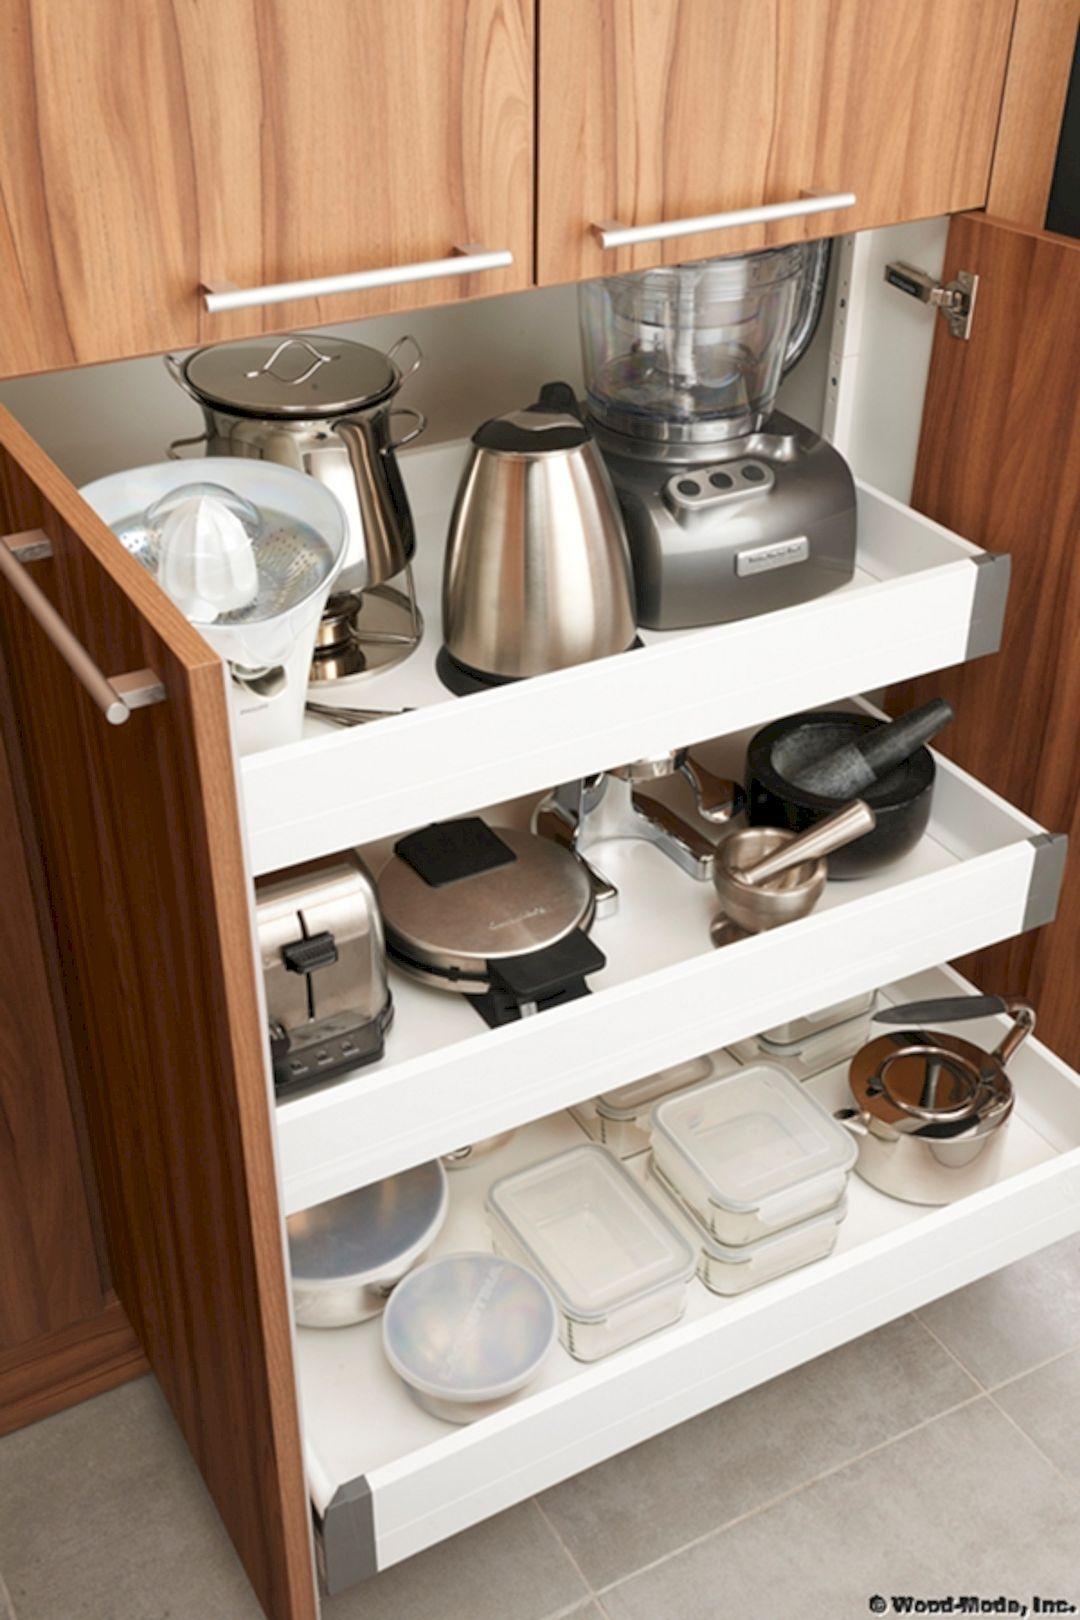 Most Brilliant Kitchen Storage Ideas (94 Photos) | Fotoshooting